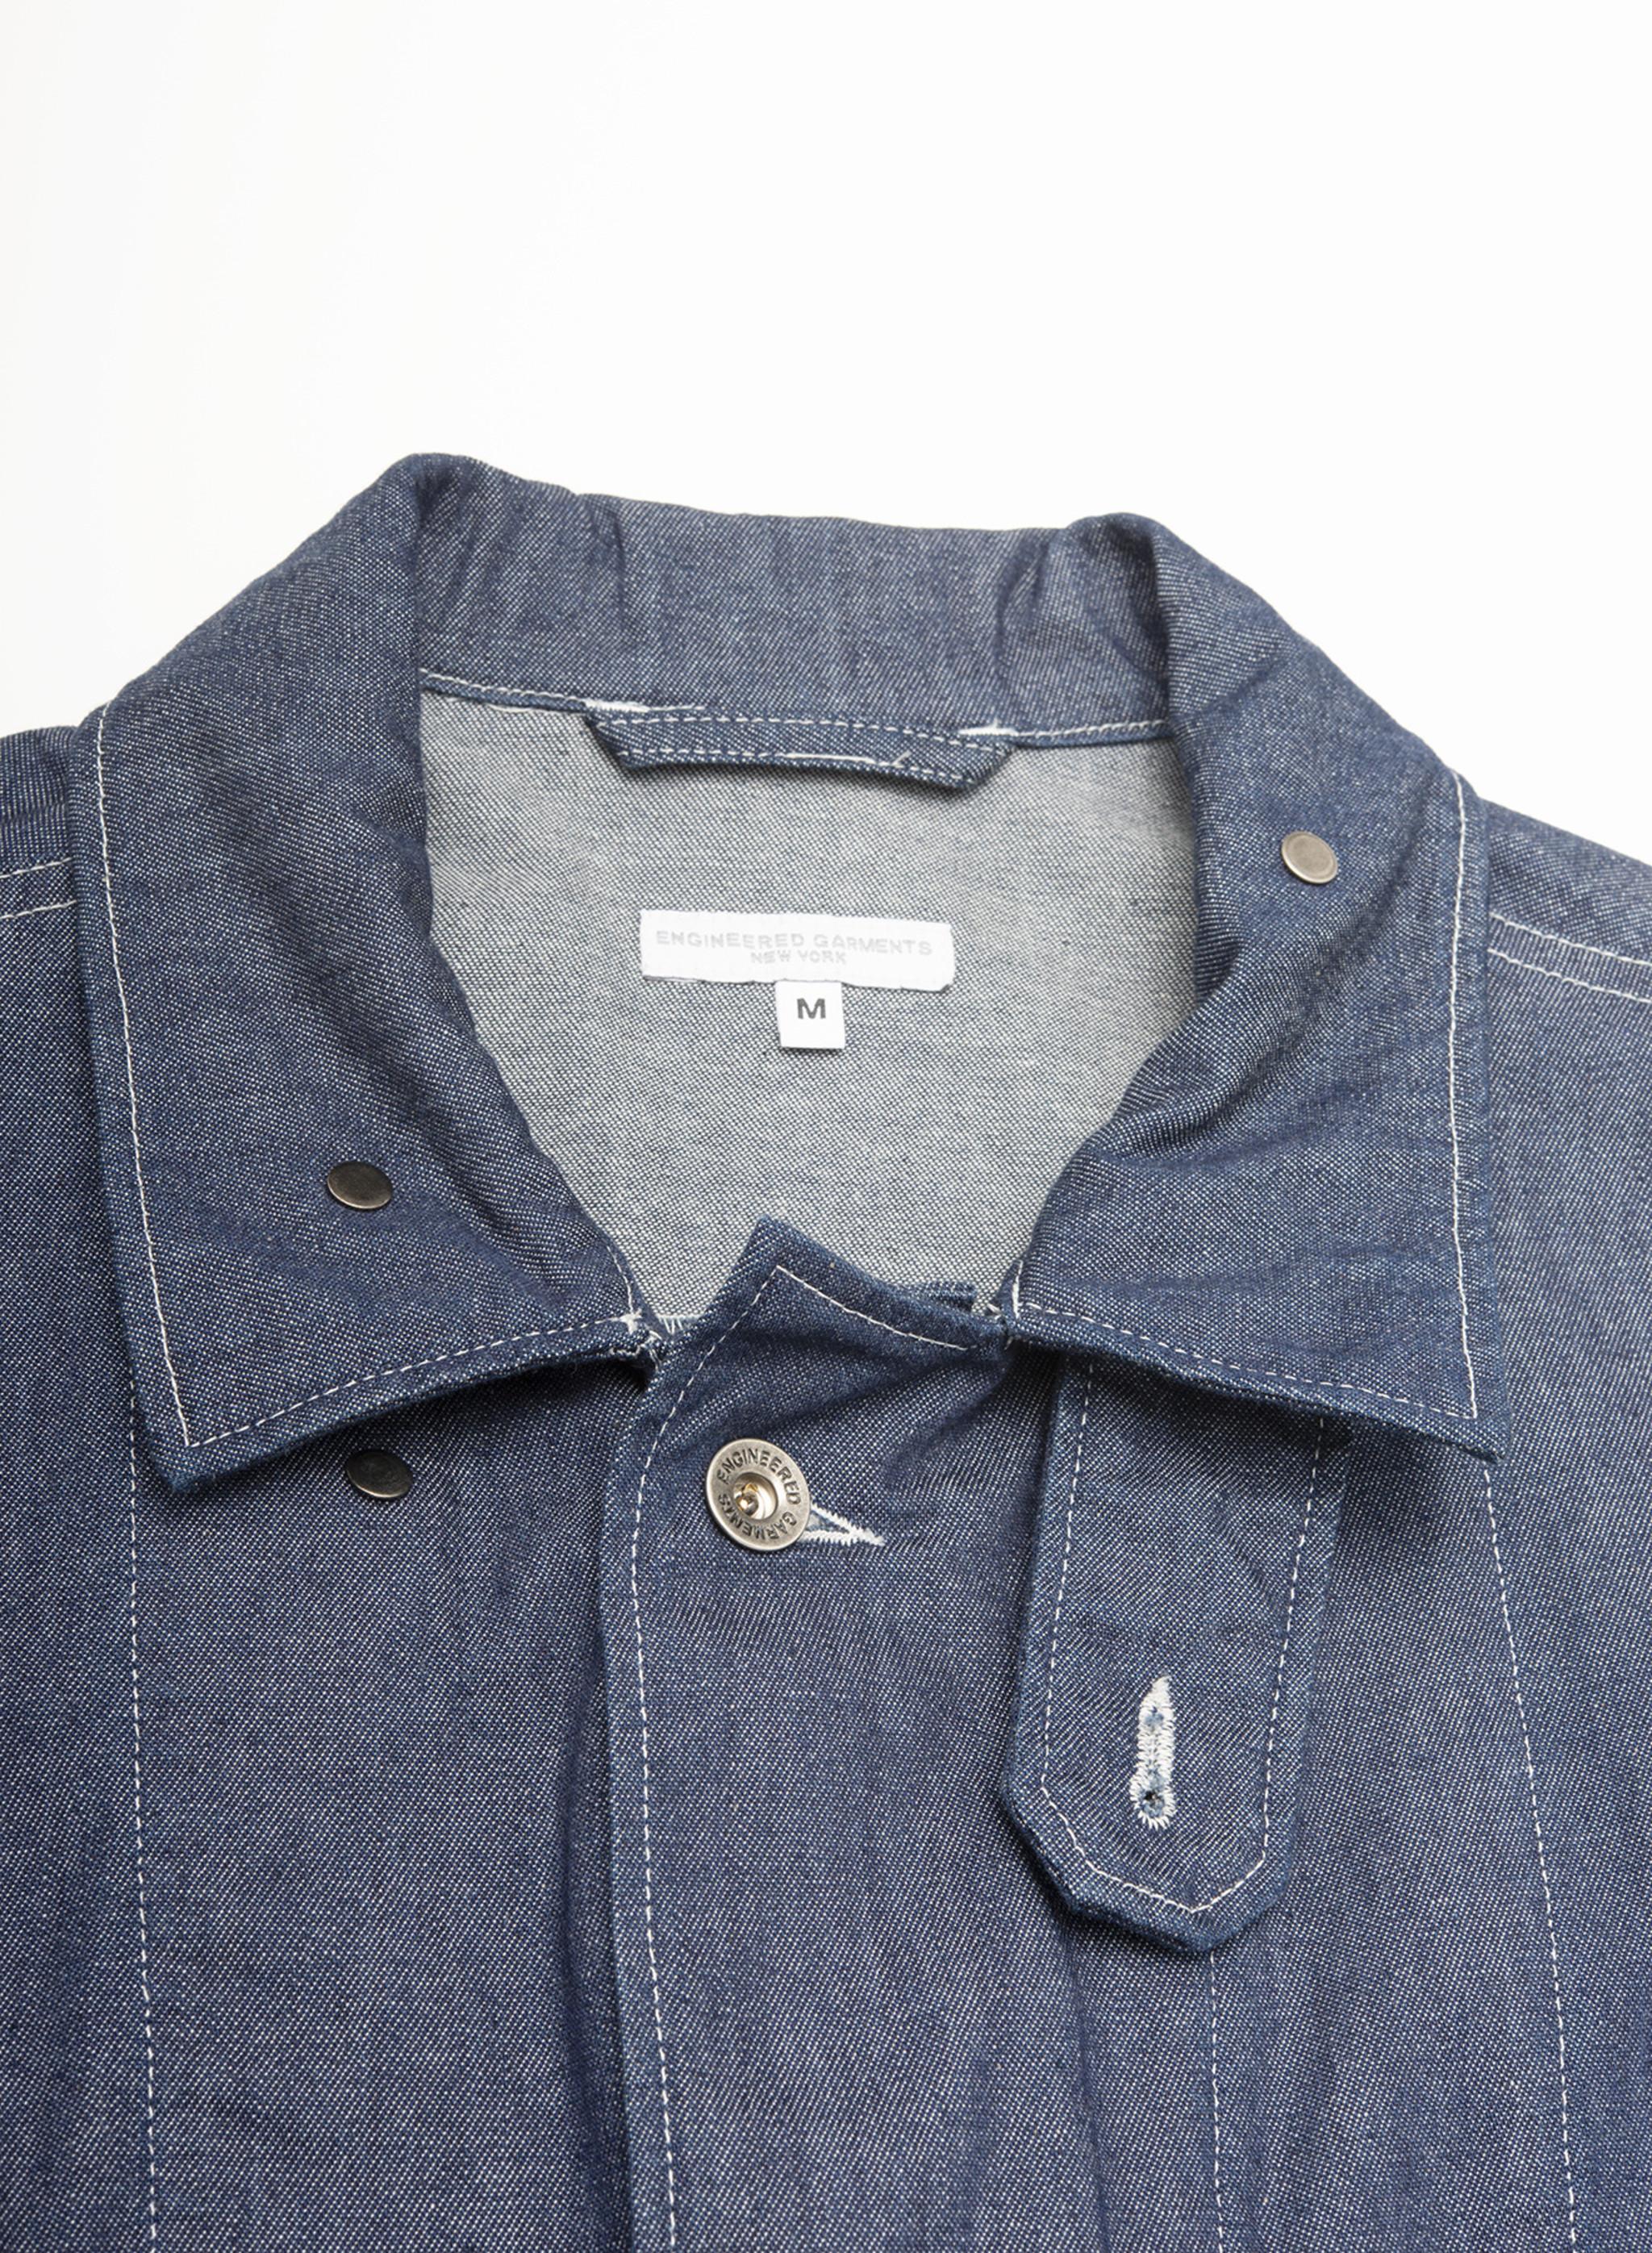 Engineered Garments M43/2 Shirt Jacket - Indigo 8oz Cone Denim